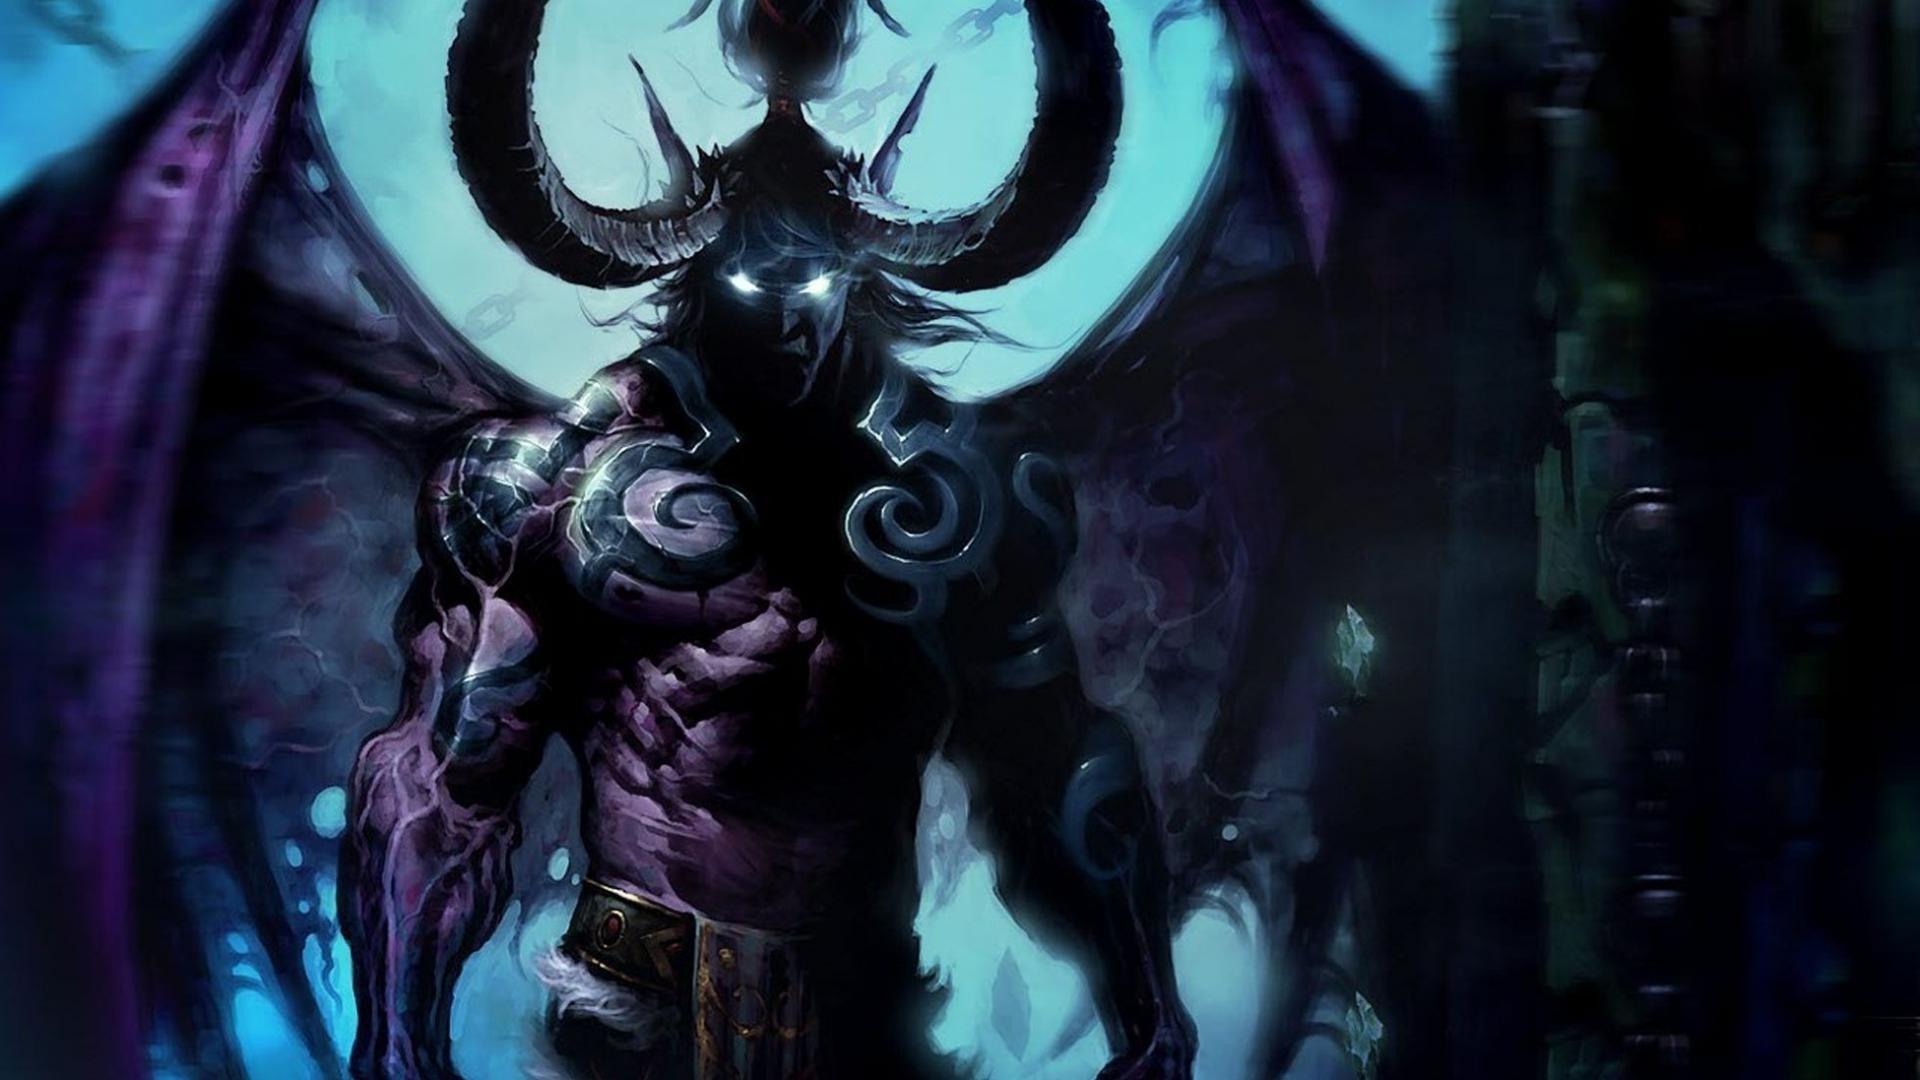 48 World Of Warcraft Illidan Wallpaper On Wallpapersafari